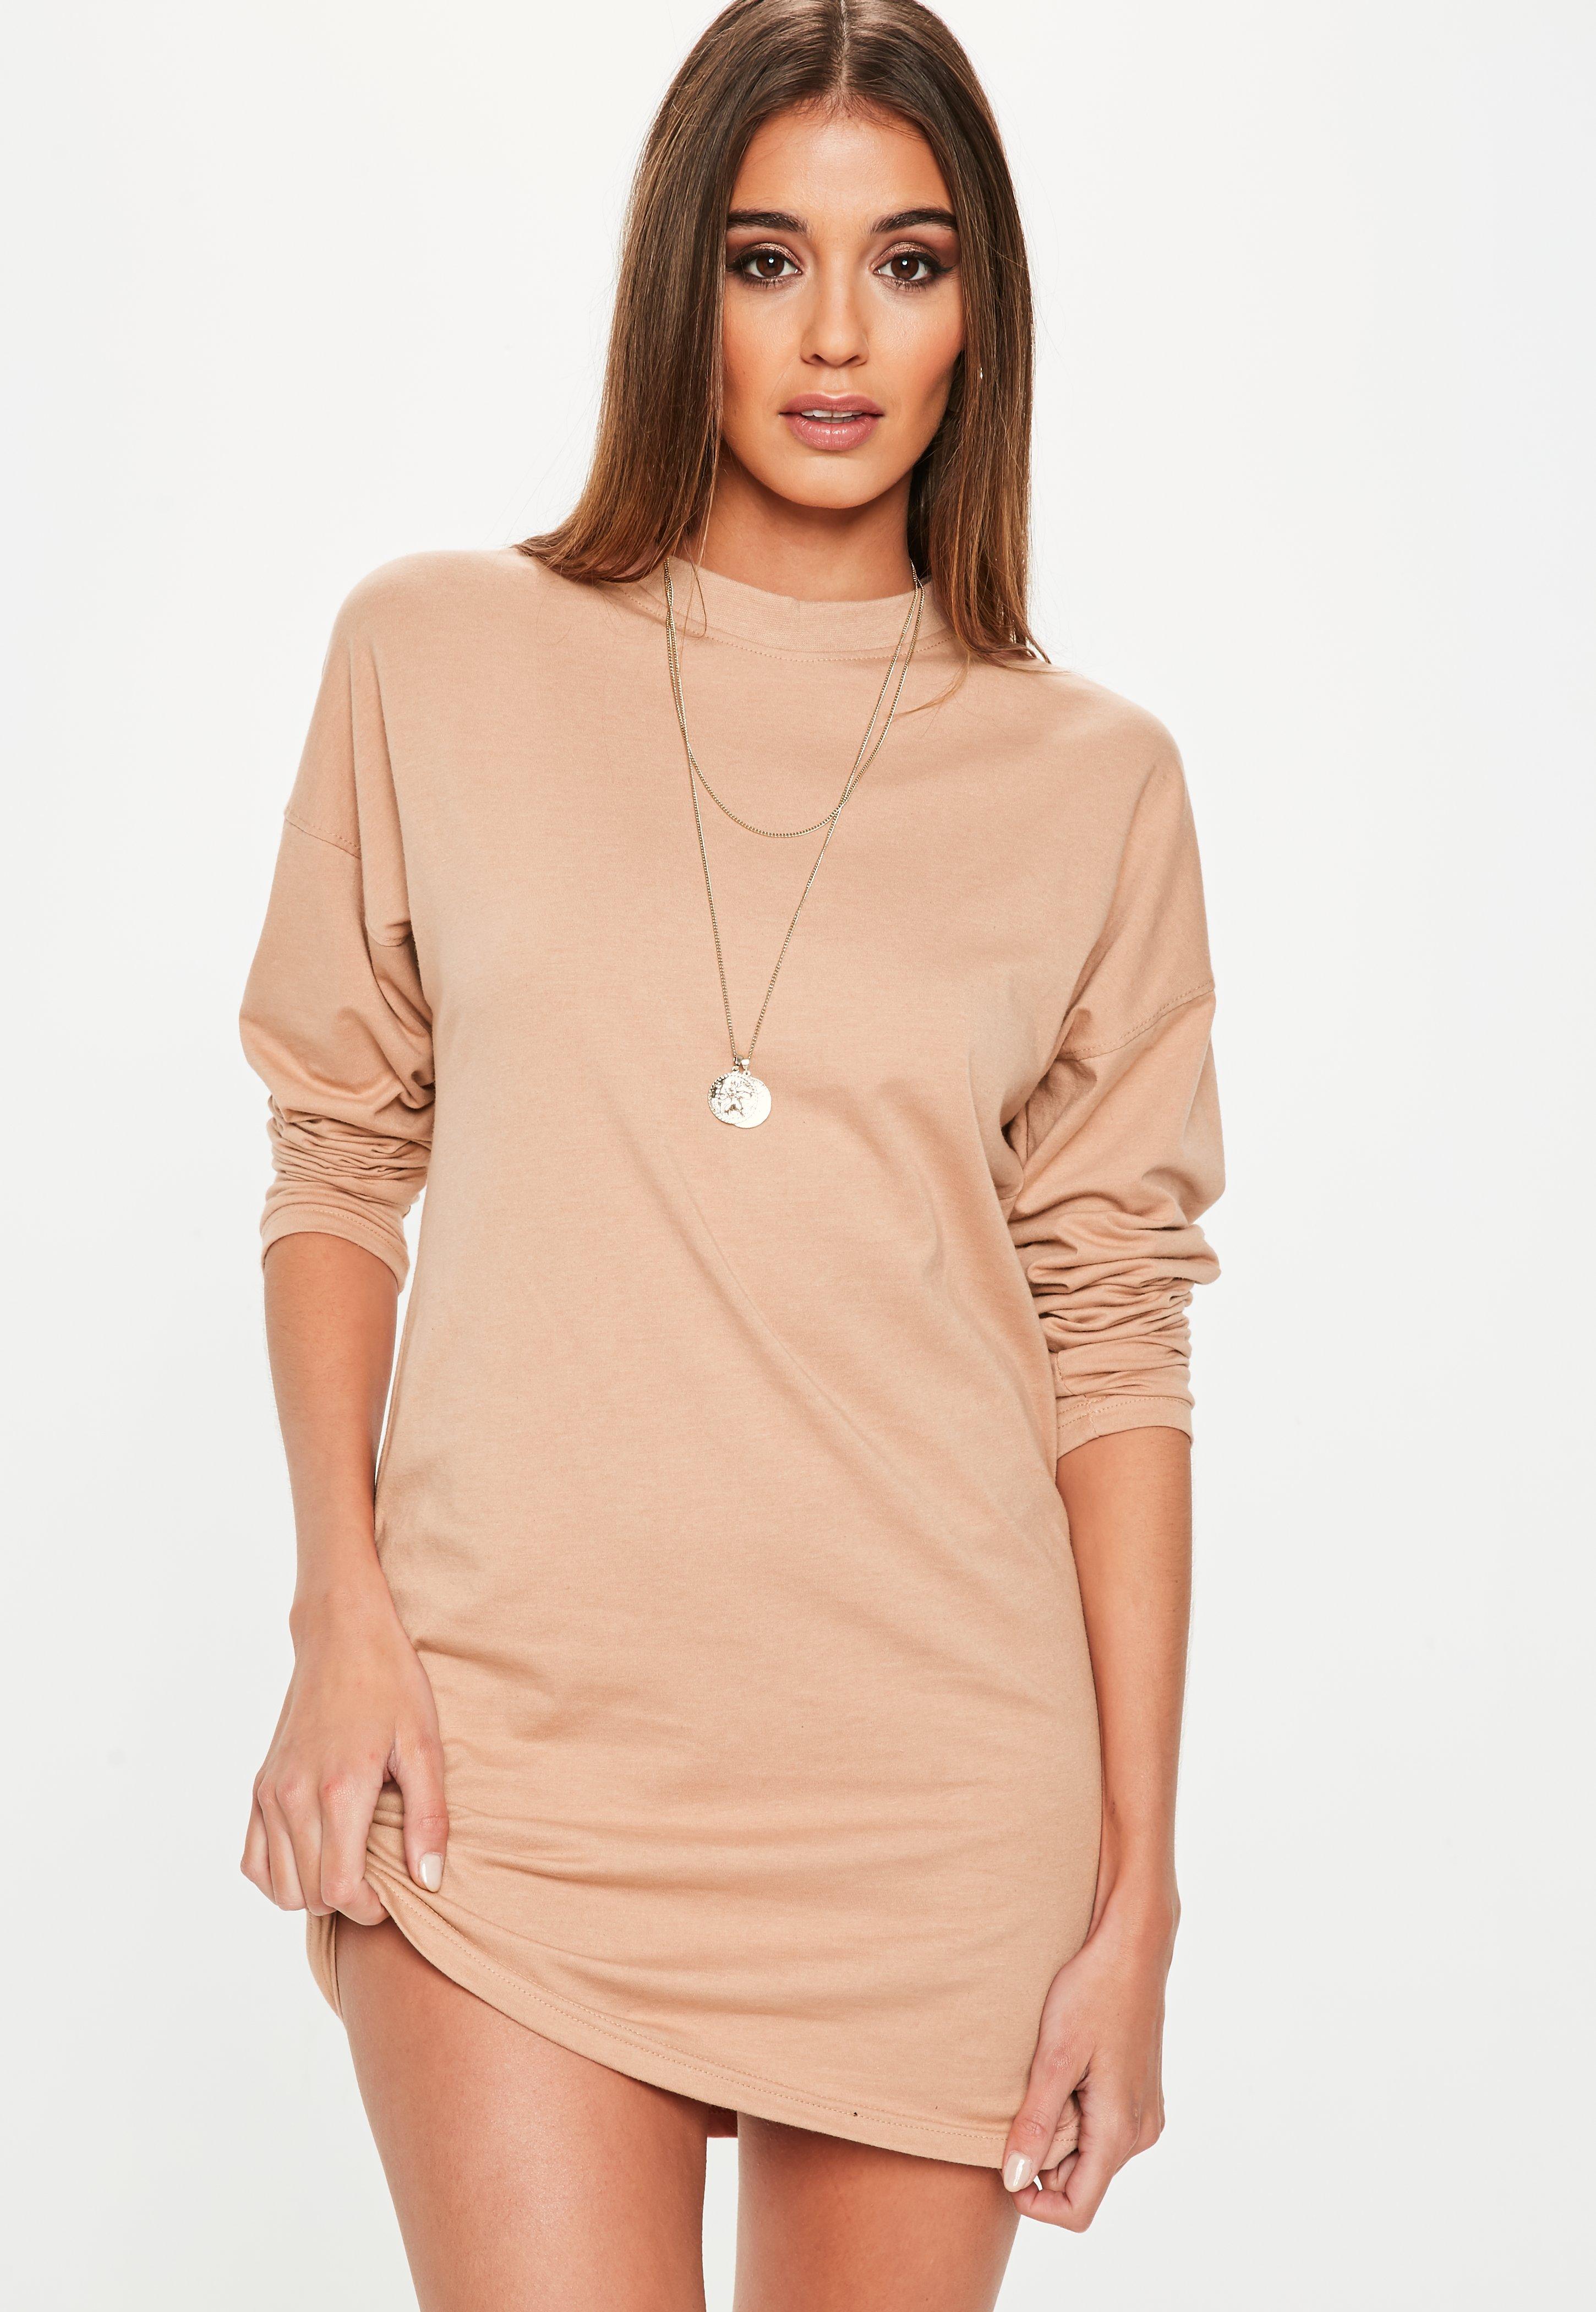 T-Shirt-Kleid – T-Shirt-Kleider online shoppen - Missguided DE